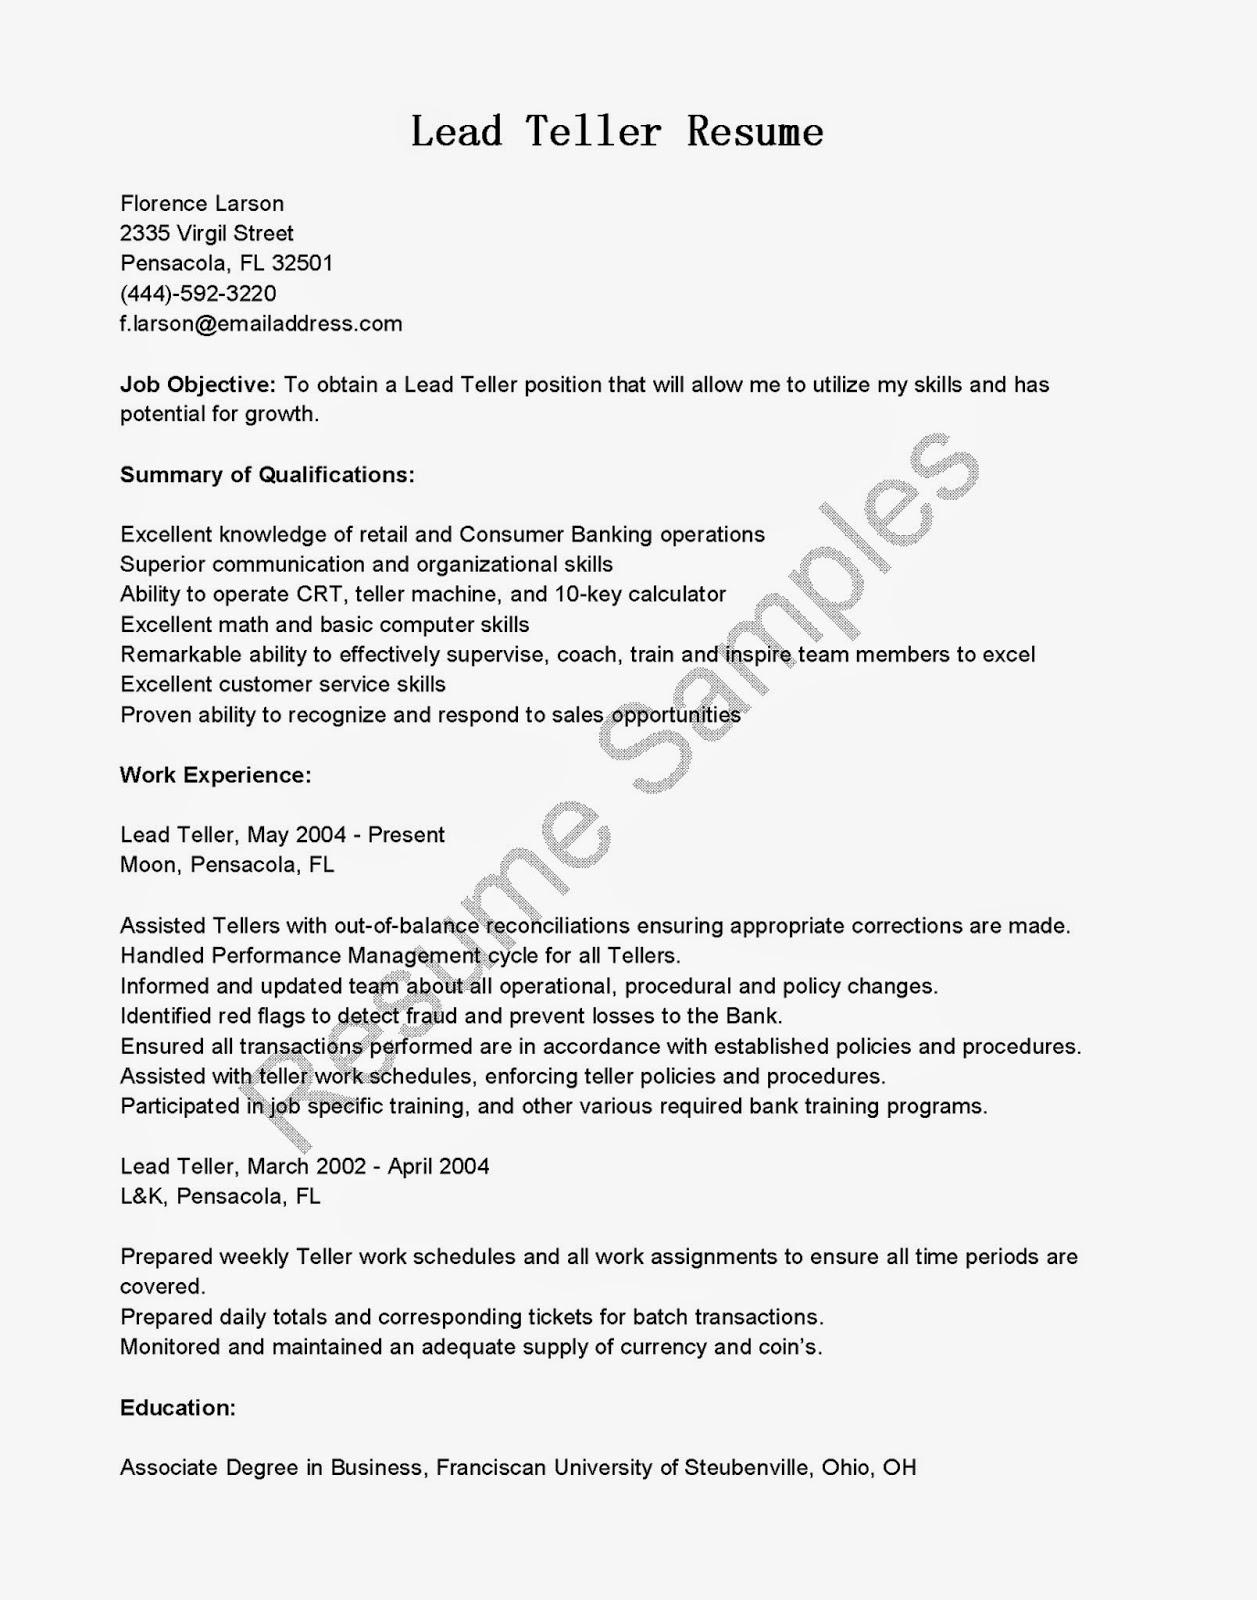 lead teller resume examples